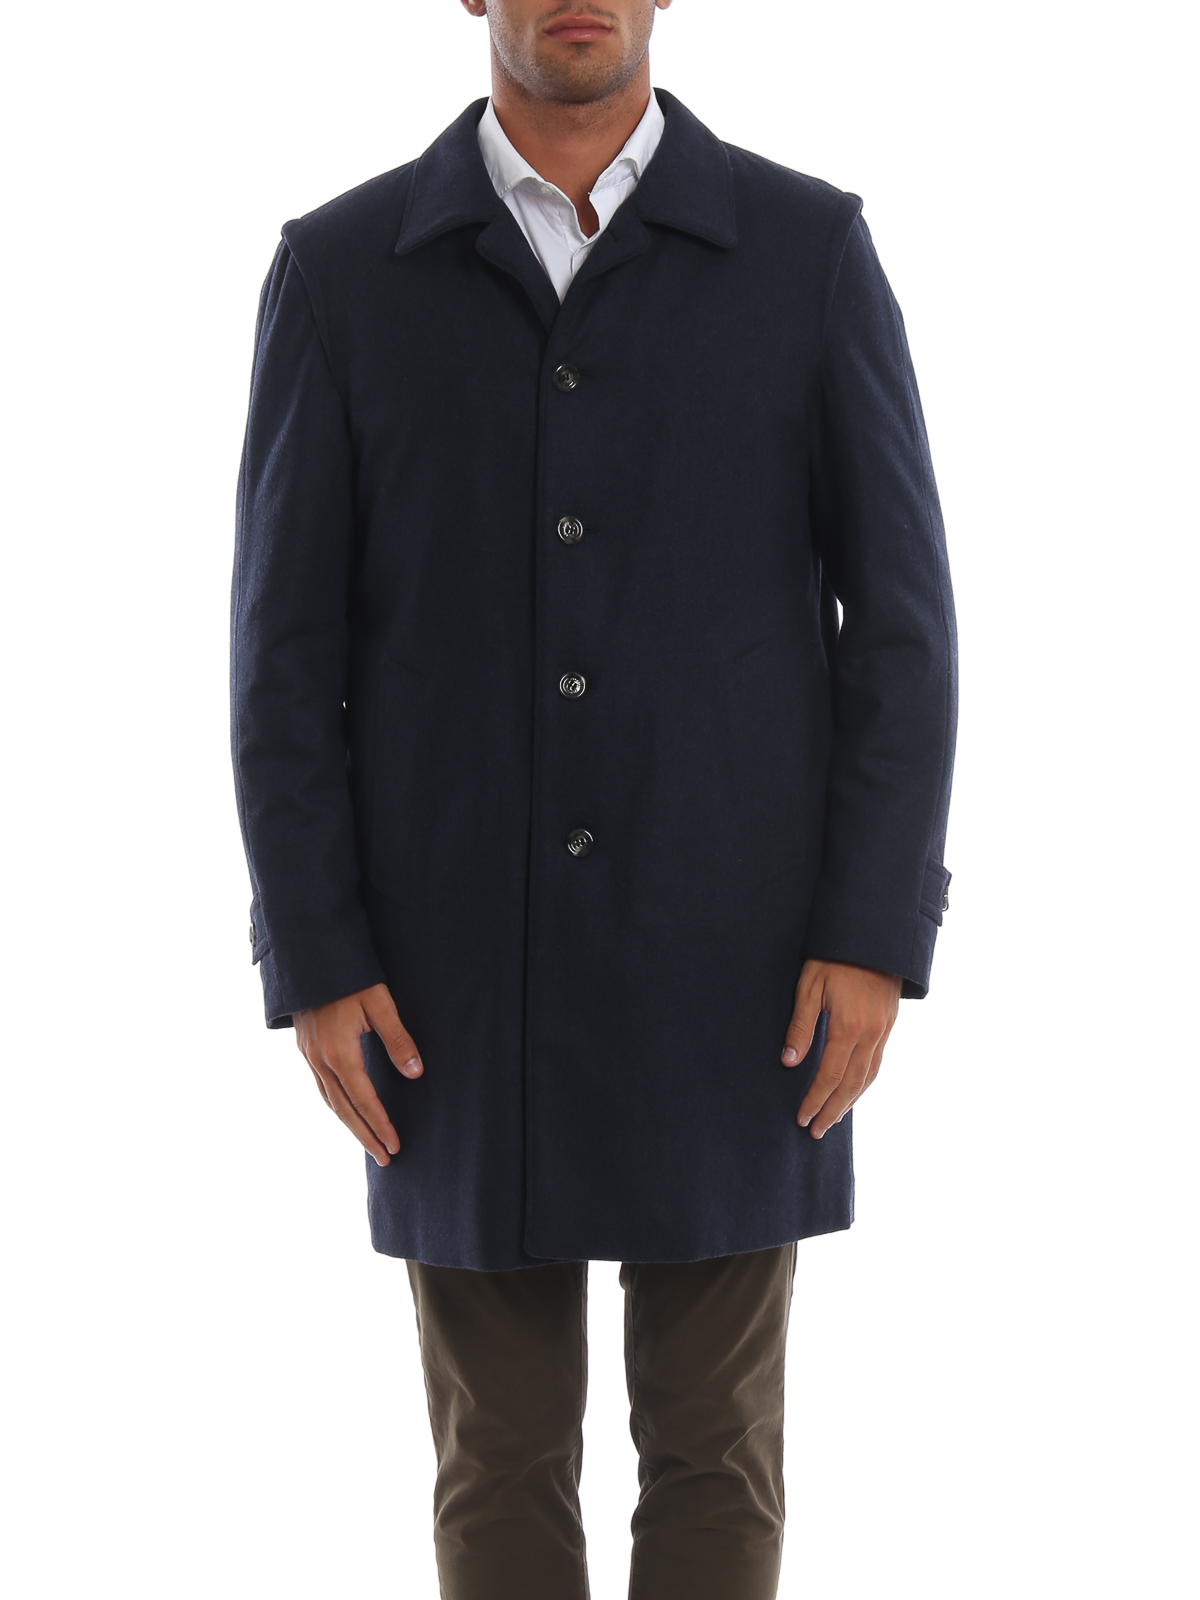 90675f559821 iKRIX-schneiders-short-coats-blue -grey-classic-loden-wool-blend-coat-00000136952f00s013.jpg